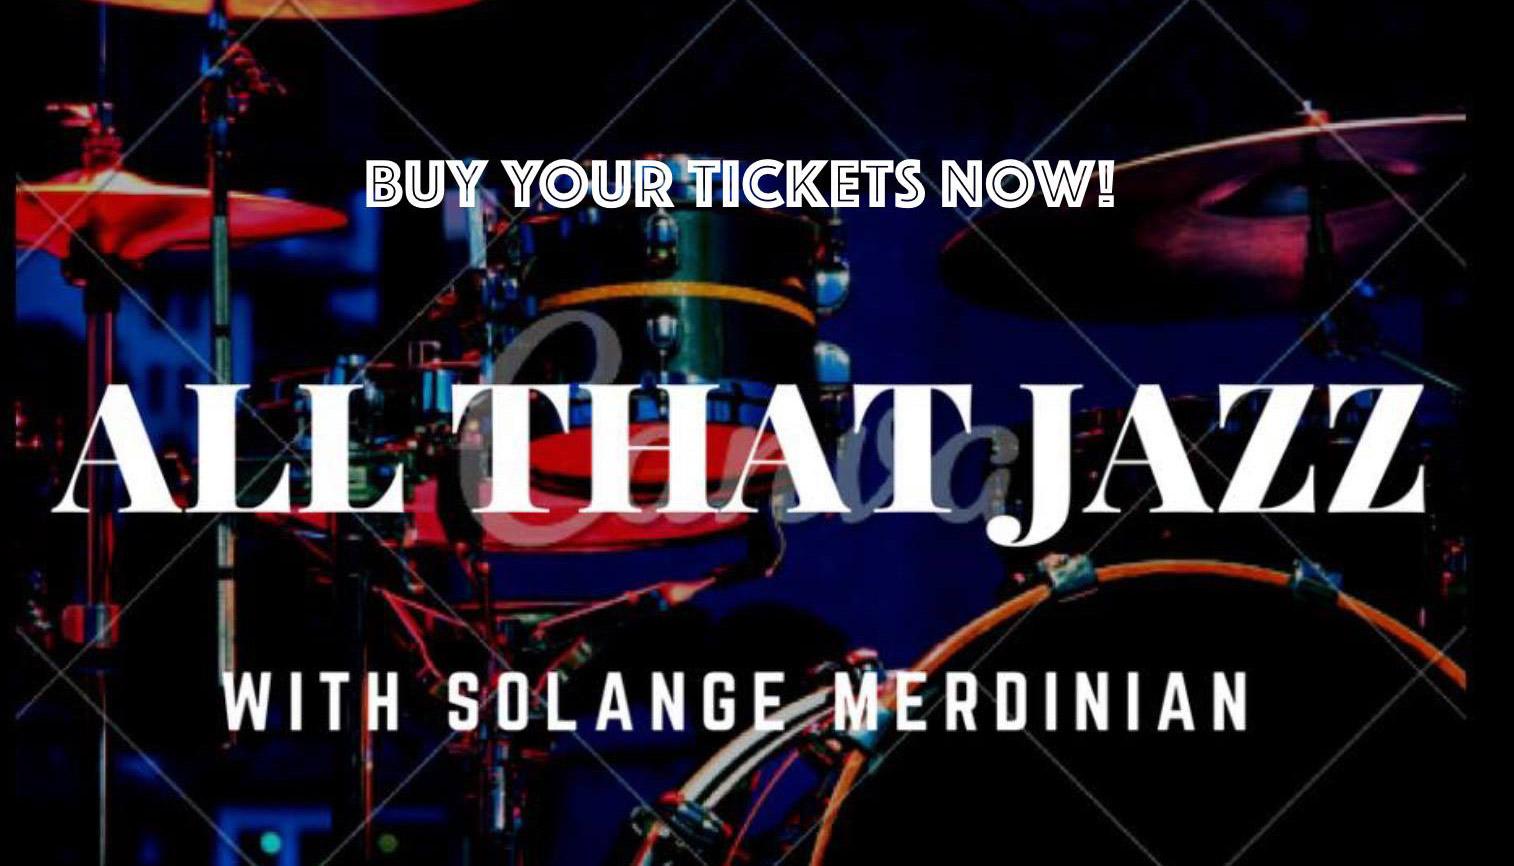 All that Jazz with Solange  Merdinian – London, UK